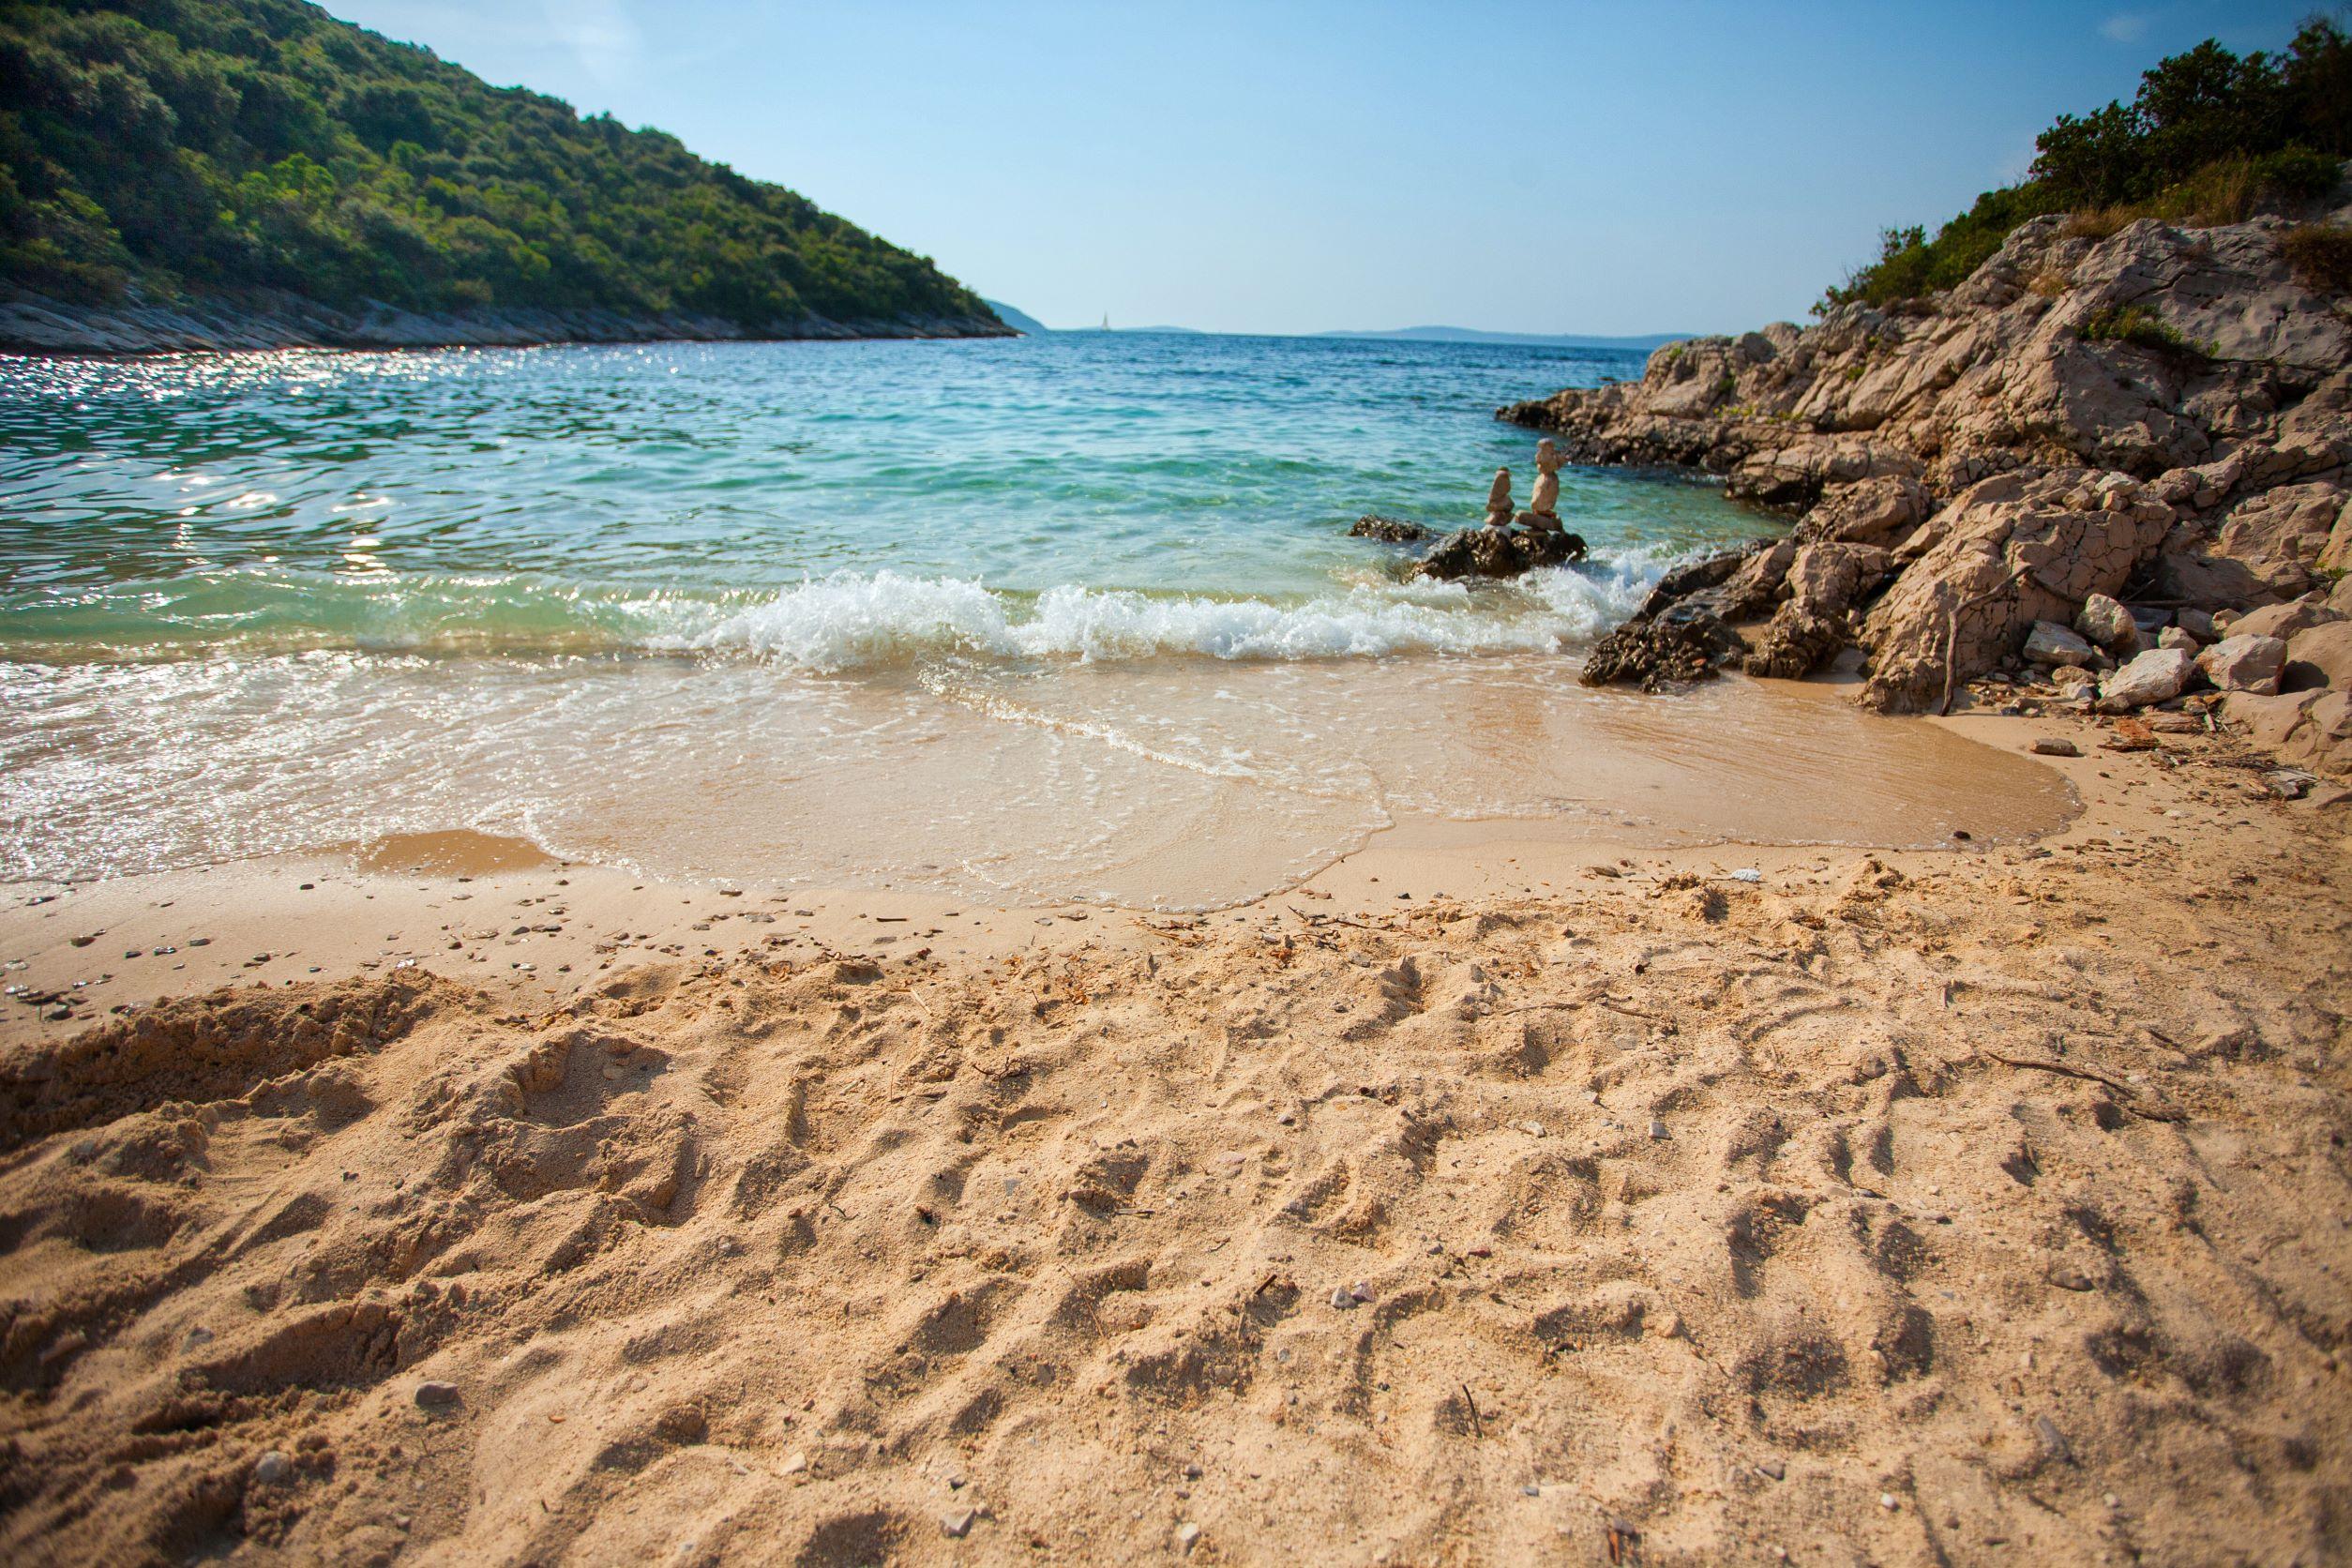 Sipkova_Beach_Solta